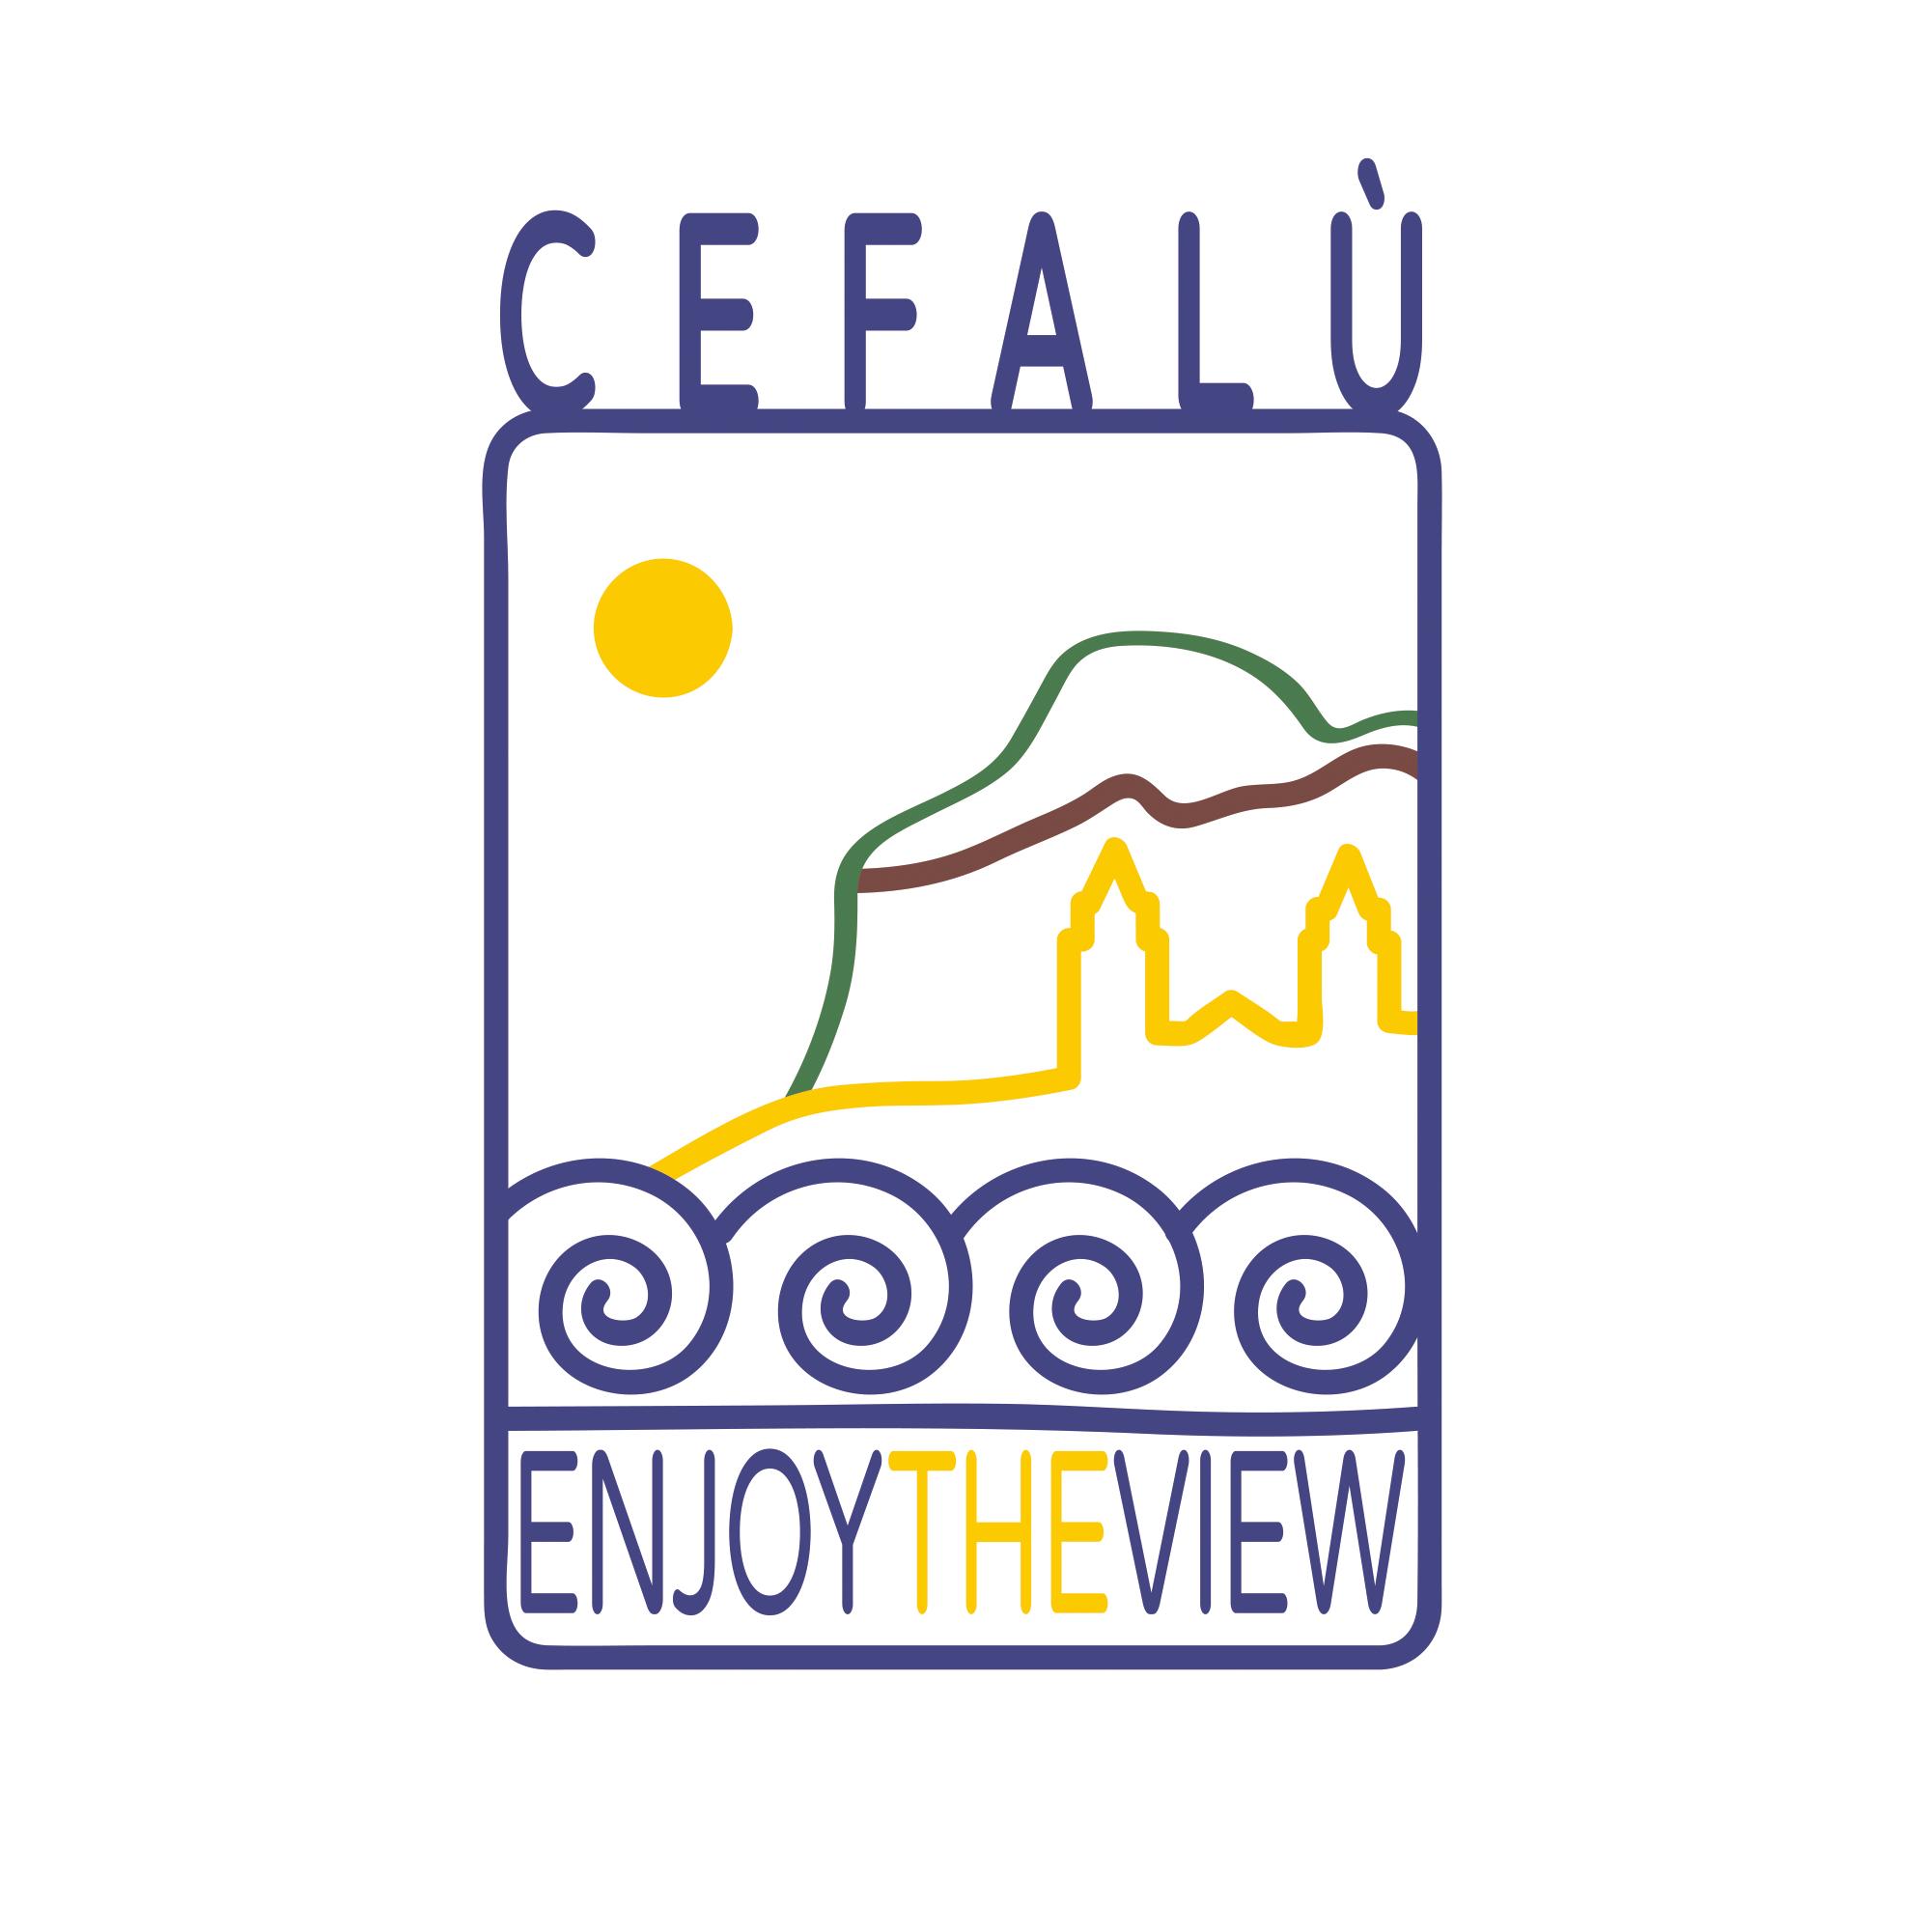 Immagine Coordinata – Logo | Cefalù | Enjoy the view